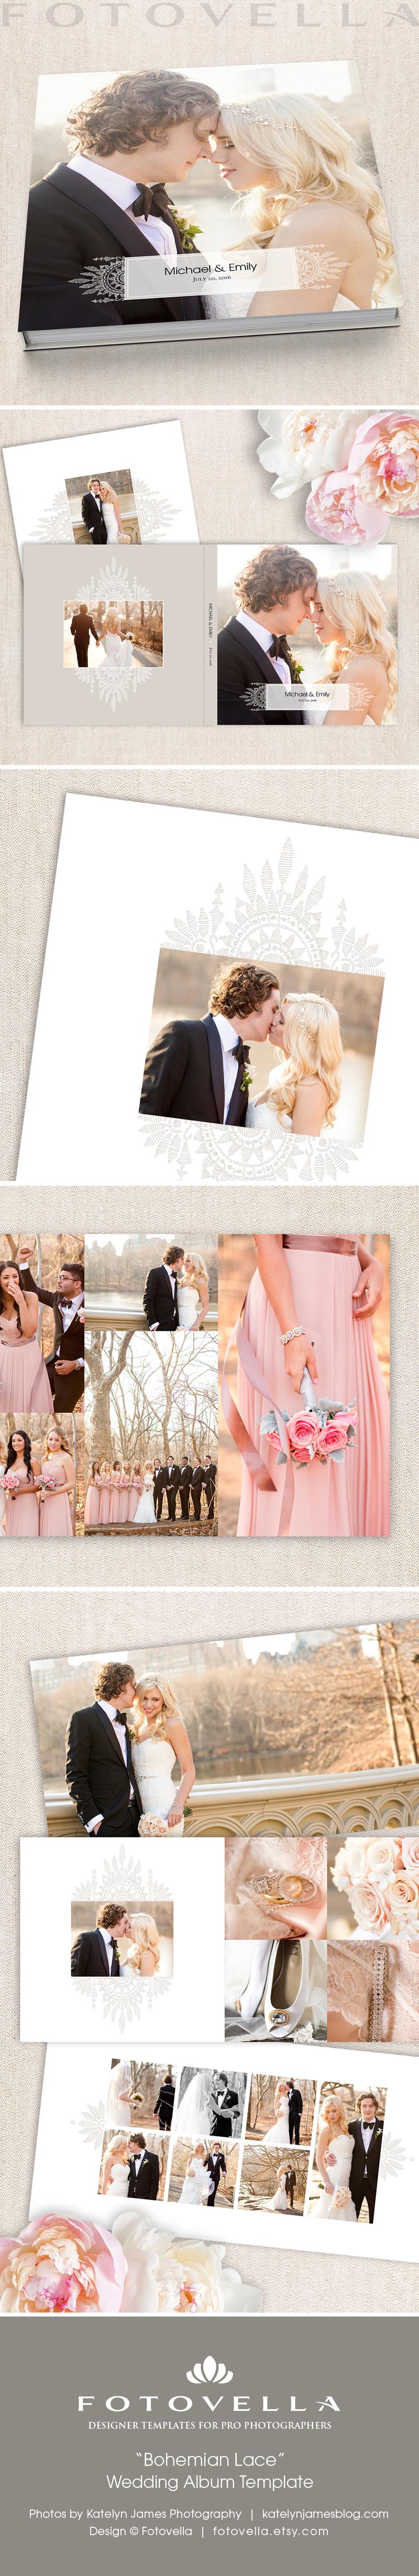 album template 12x12 wedding album for pro photographers